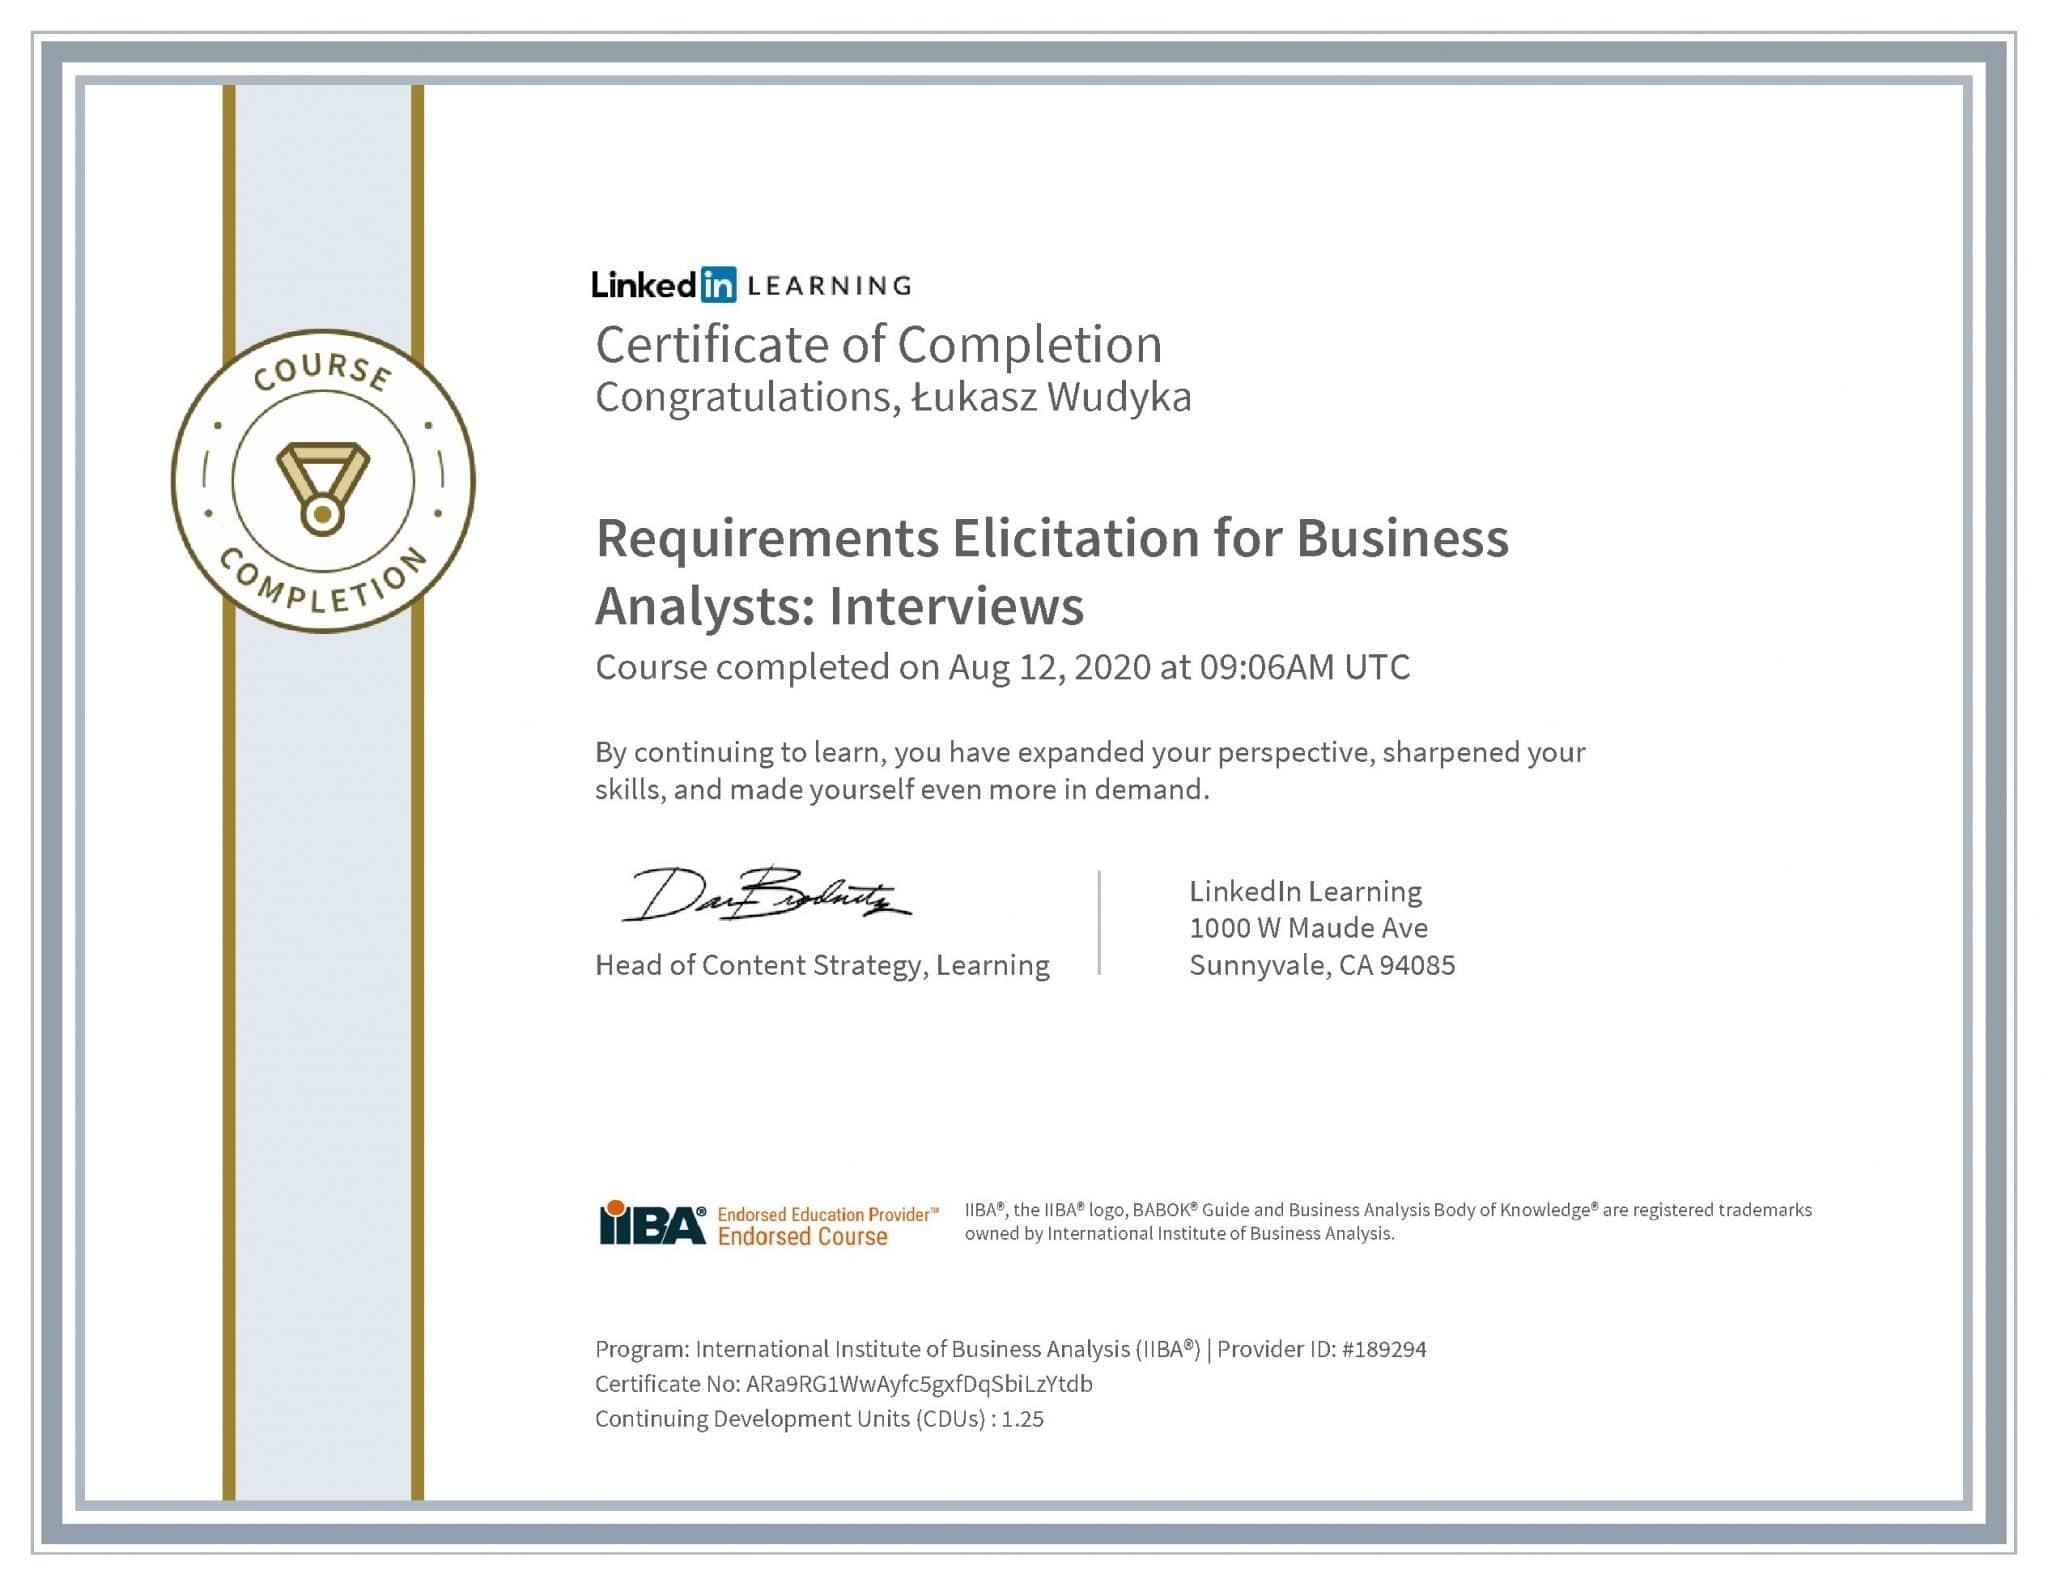 Łukasz Wudyka certyfikat LinkedIn Requirements Elicitation for Business Analysts: Interviews IIBA